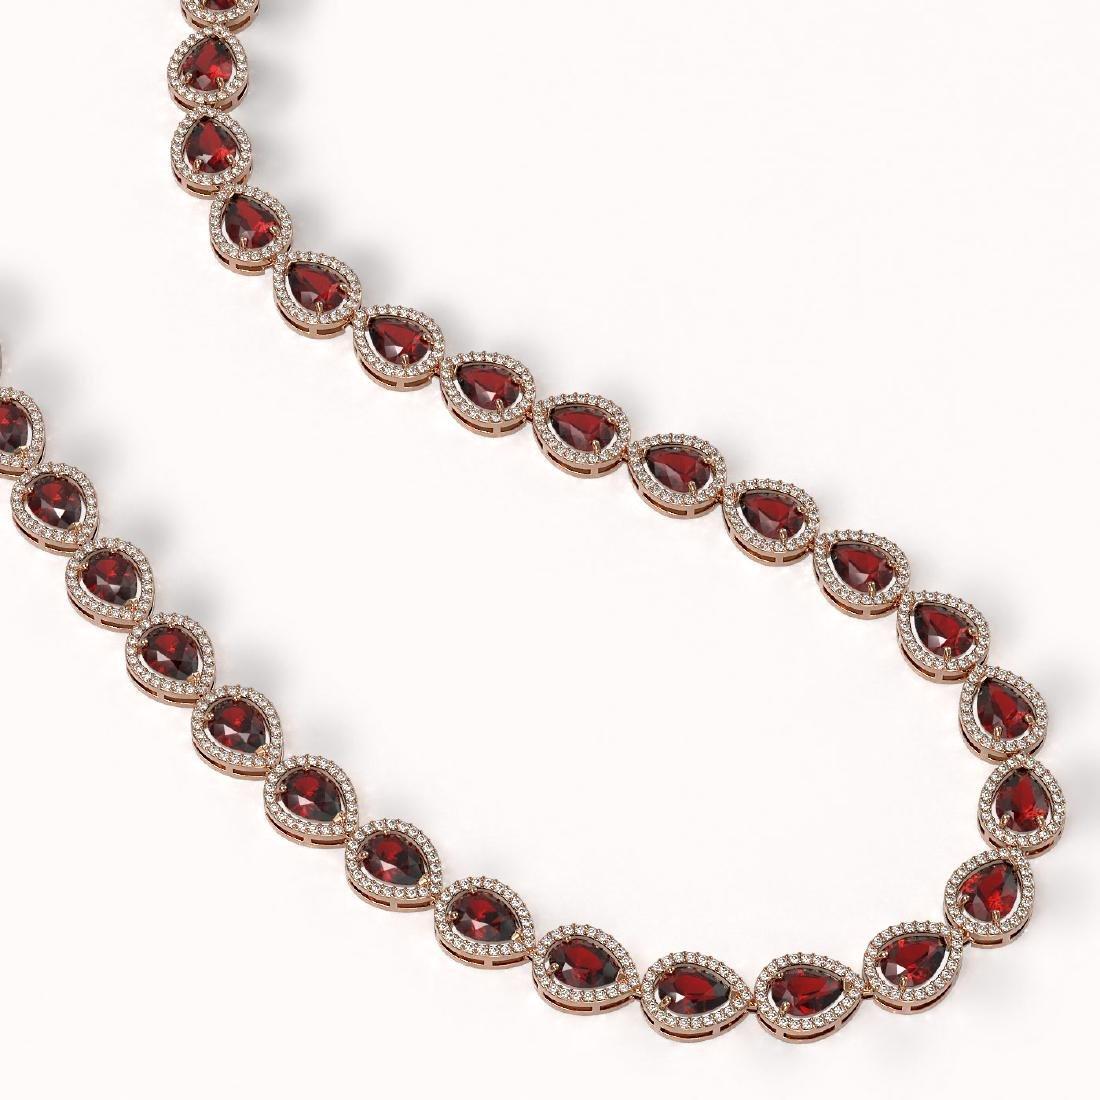 36.93 CTW Garnet & Diamond Halo Necklace 10K Rose Gold - 2